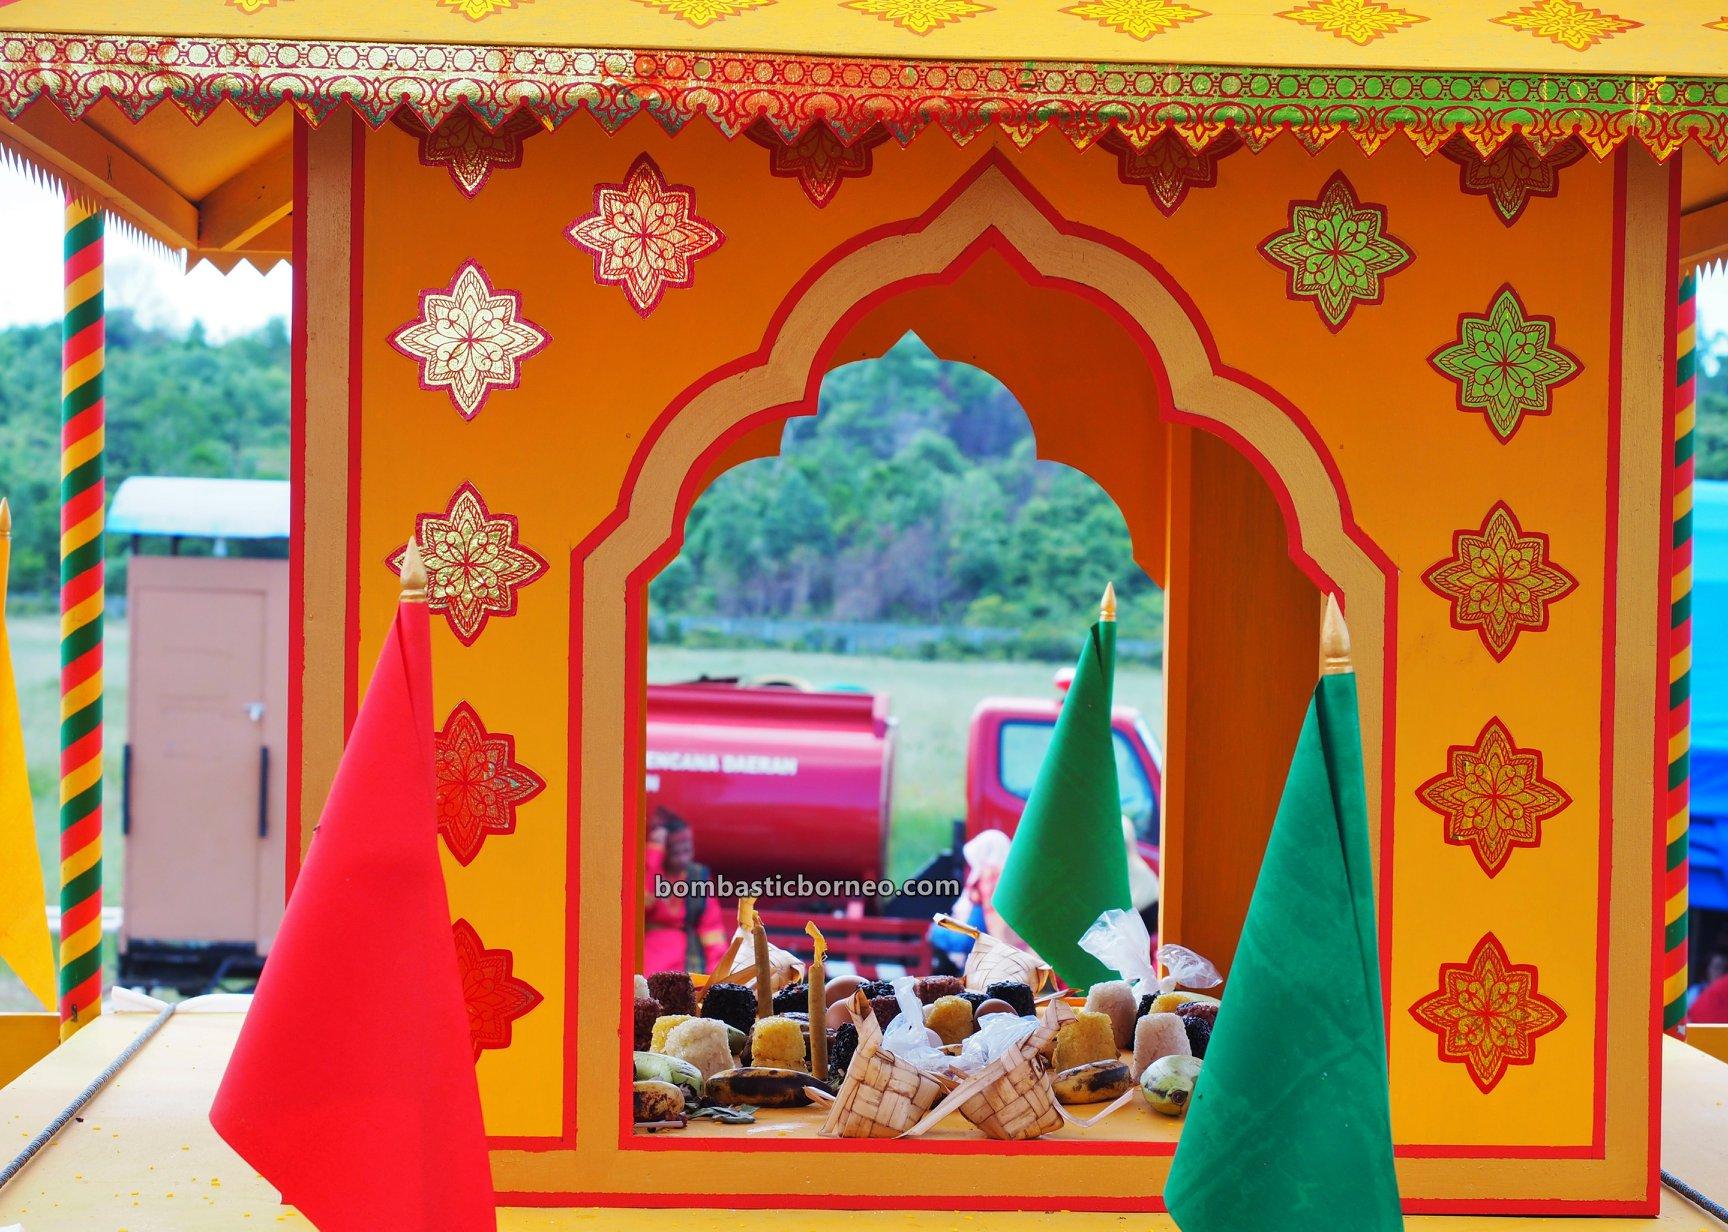 Festival Iraw Tengkayu, upacara adat, authentic, traditional, ritual, native, tribal, Indonesia, Kalimantan Utara, Pariwisata, Tourism, travel guide, Borneo, 印尼北加里曼丹, 打拉根岛土著文化